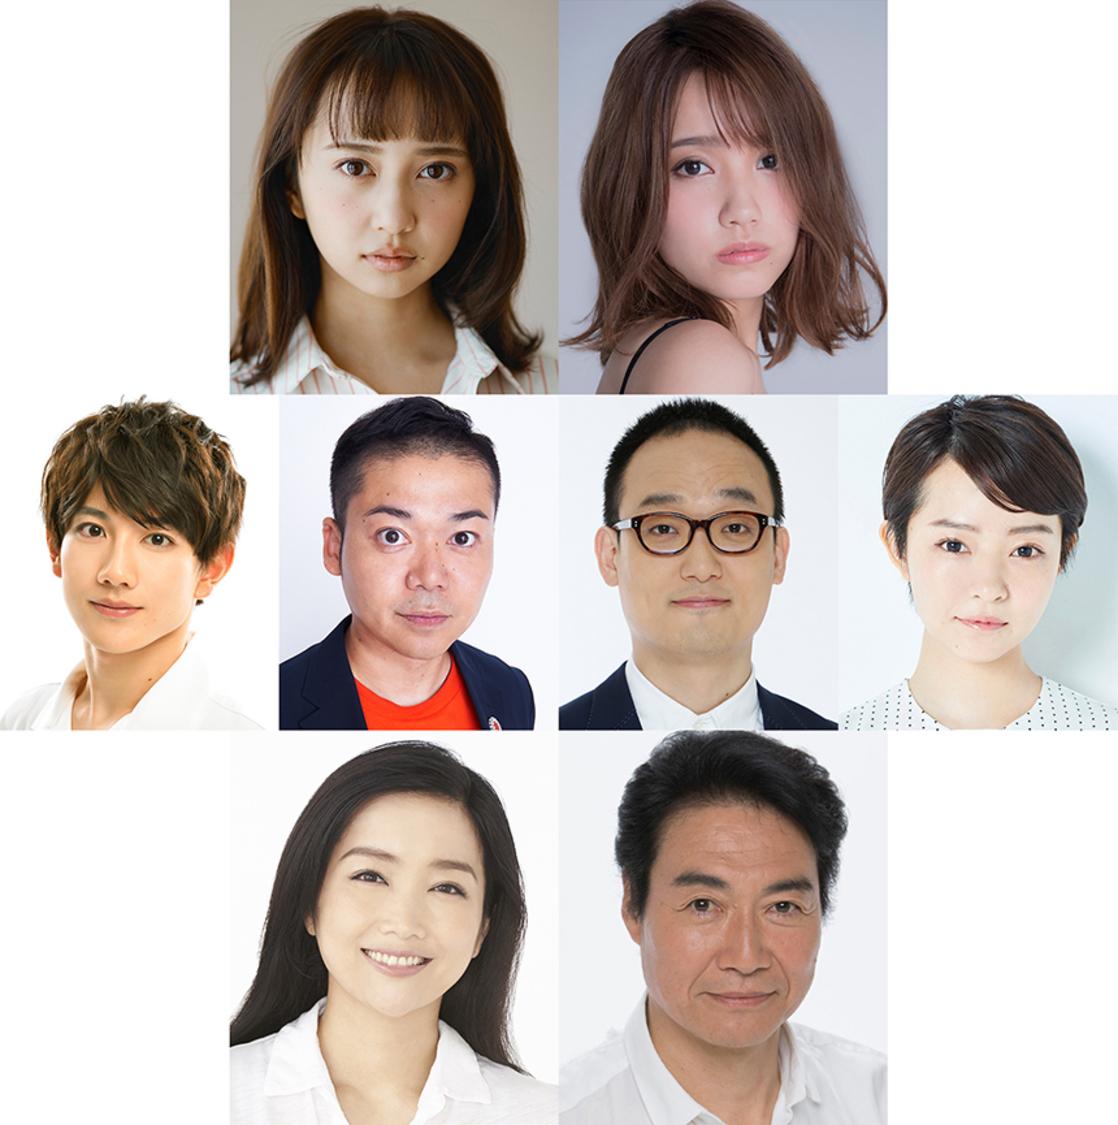 小宮有紗(Aqours)&加藤玲奈(AKB48)、主演舞台<体育教師たちの憂鬱>上演決定!